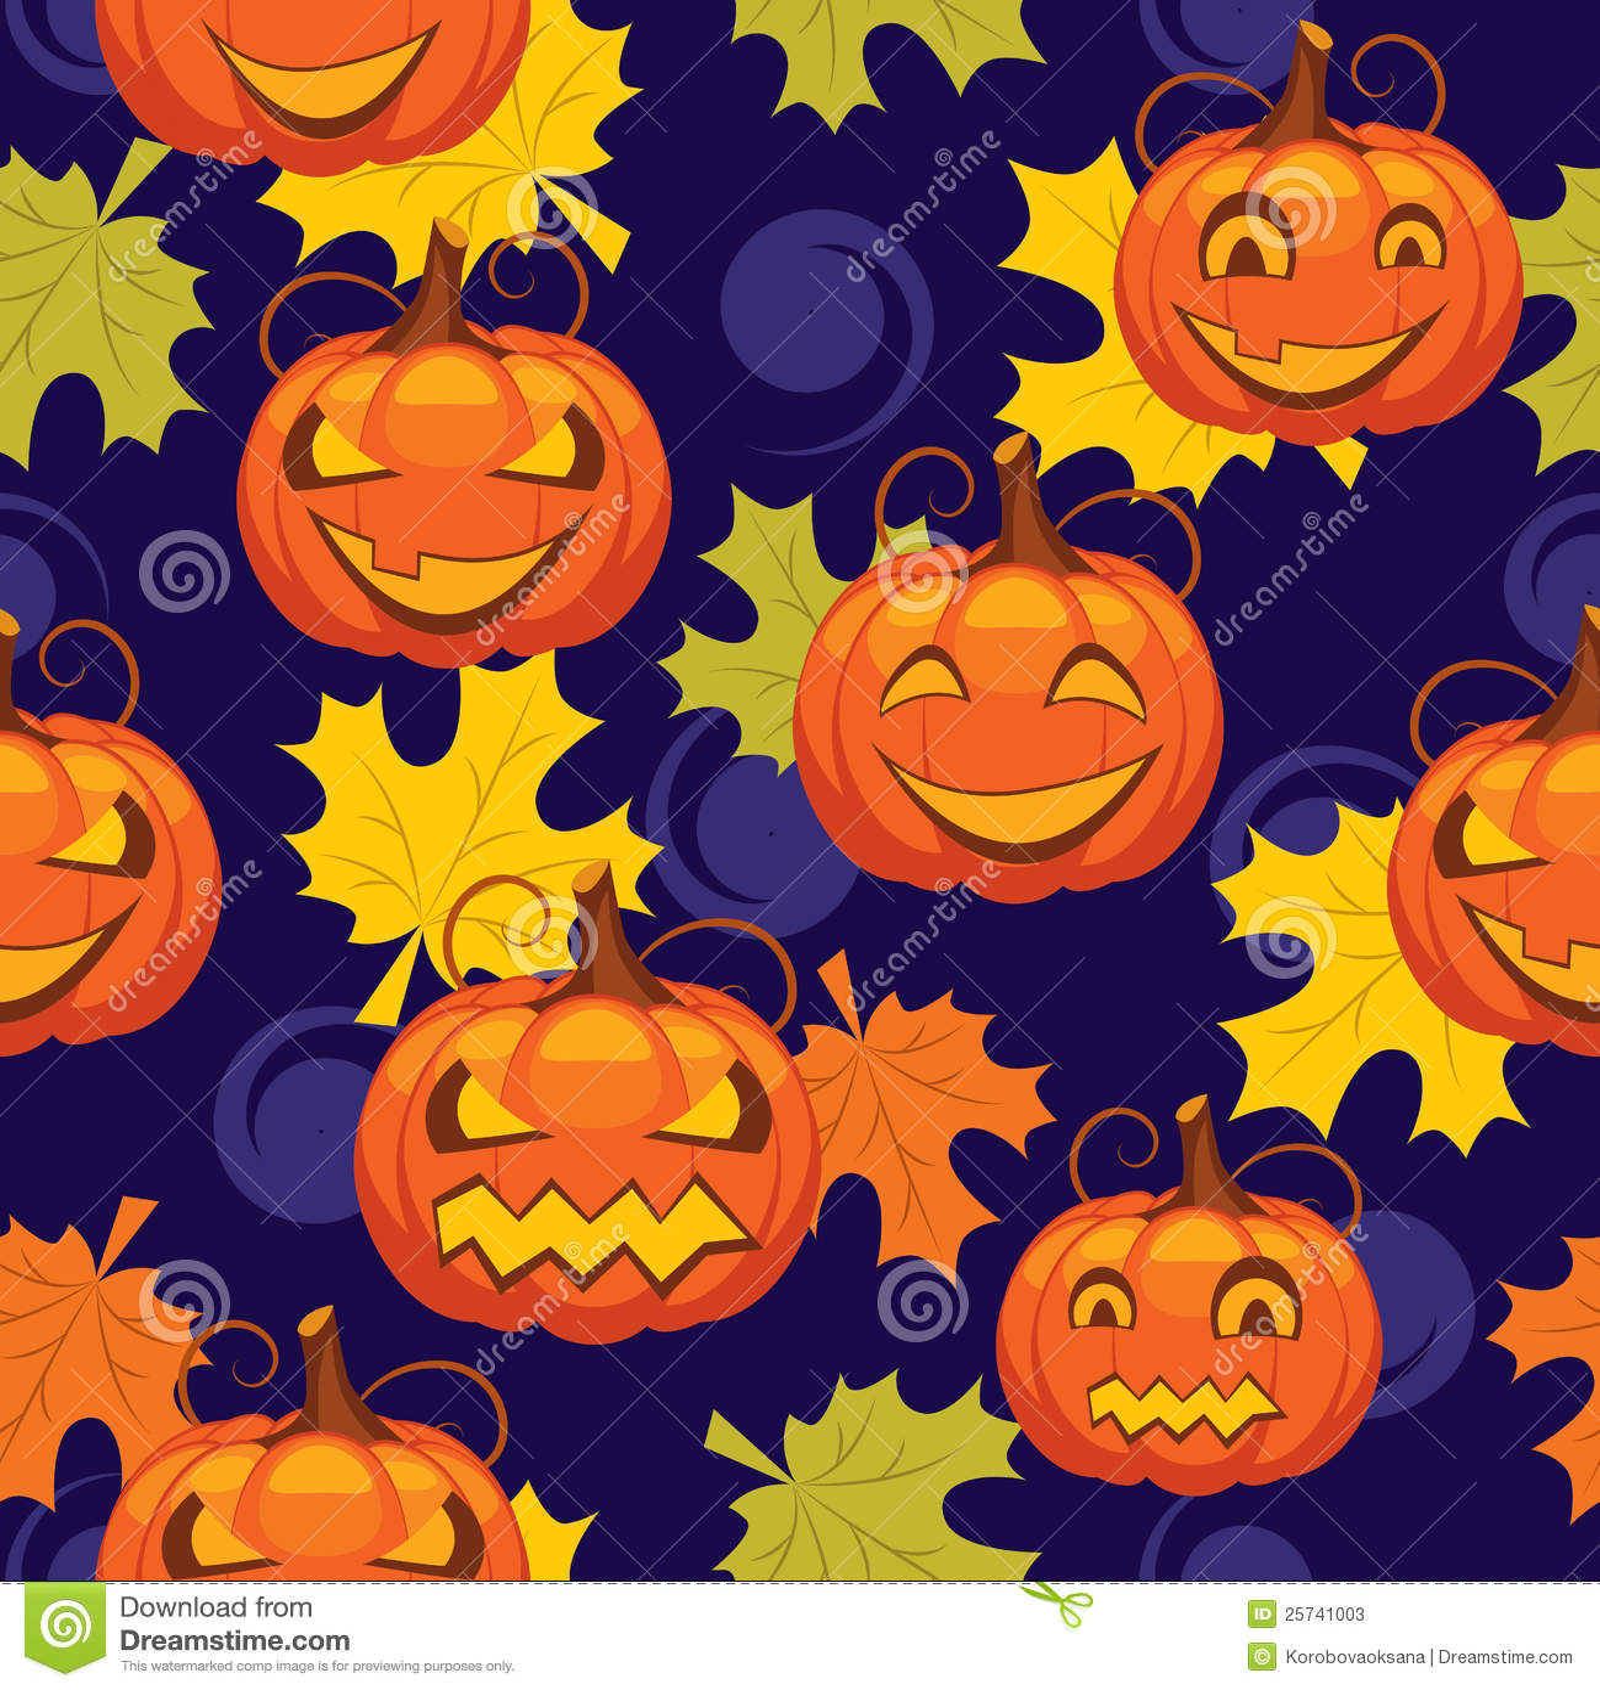 Seamless pattern of Halloween